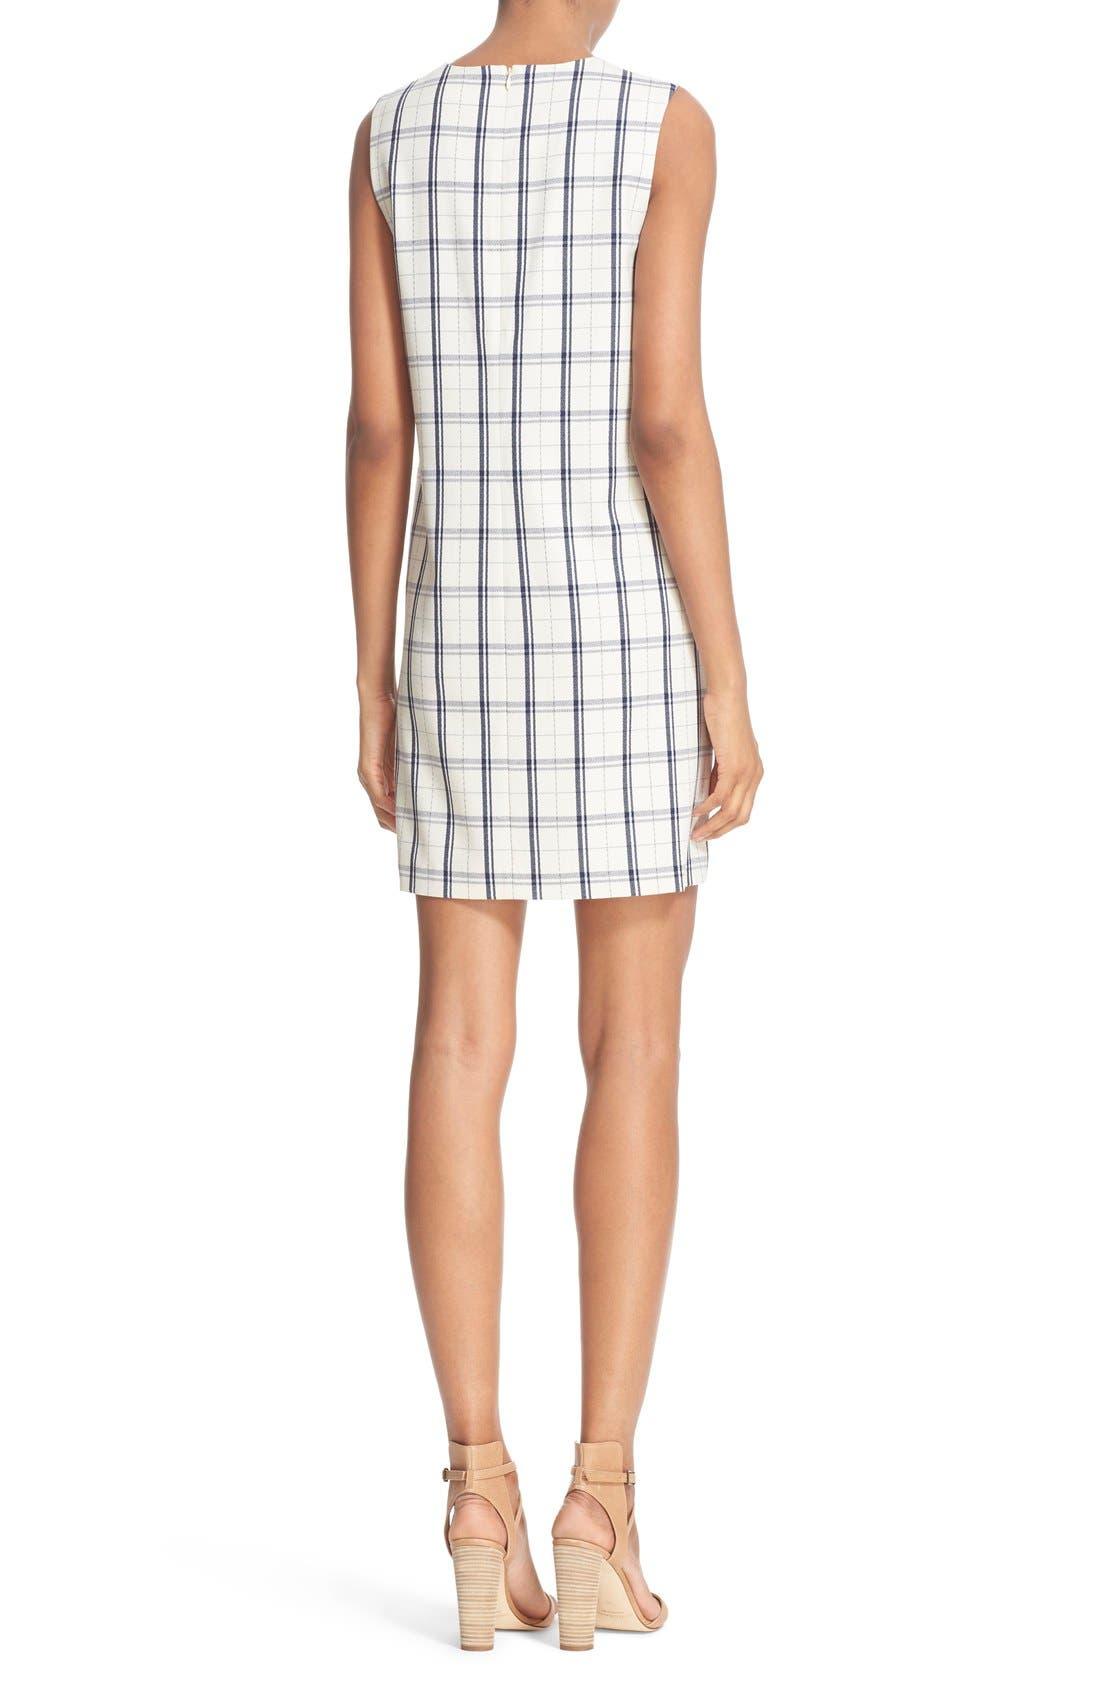 THEORY,                             'Adraya' Check Stretch Wool Shift Dress,                             Alternate thumbnail 5, color,                             900